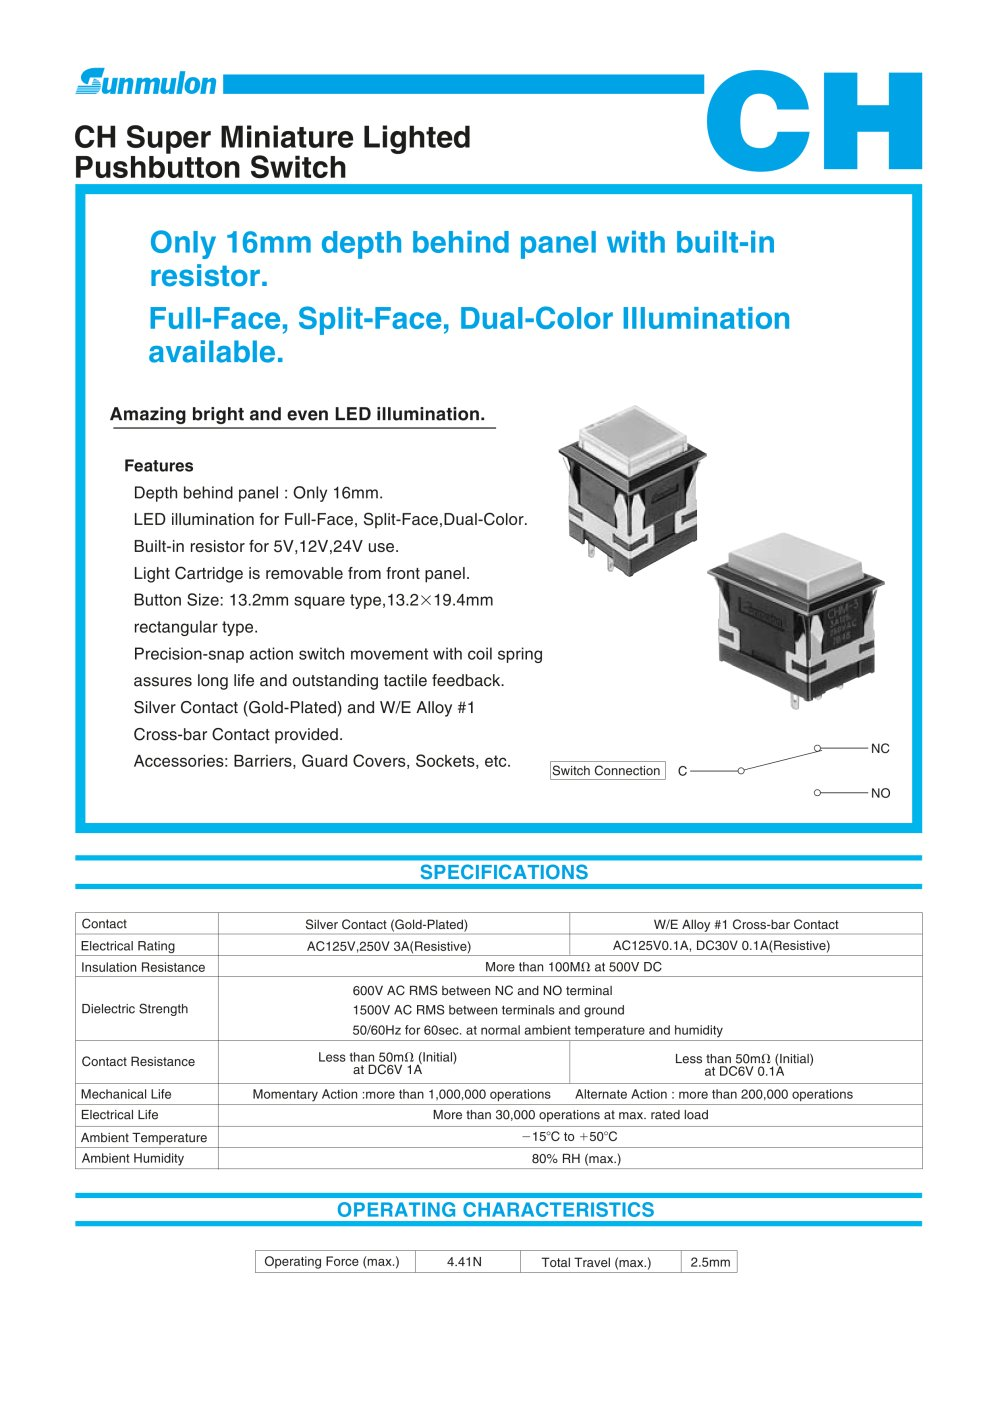 Ch Super Miniature Lighted Pushbutton Switch Sunmulon Pdf Push Button 5mm 1 11 Pages